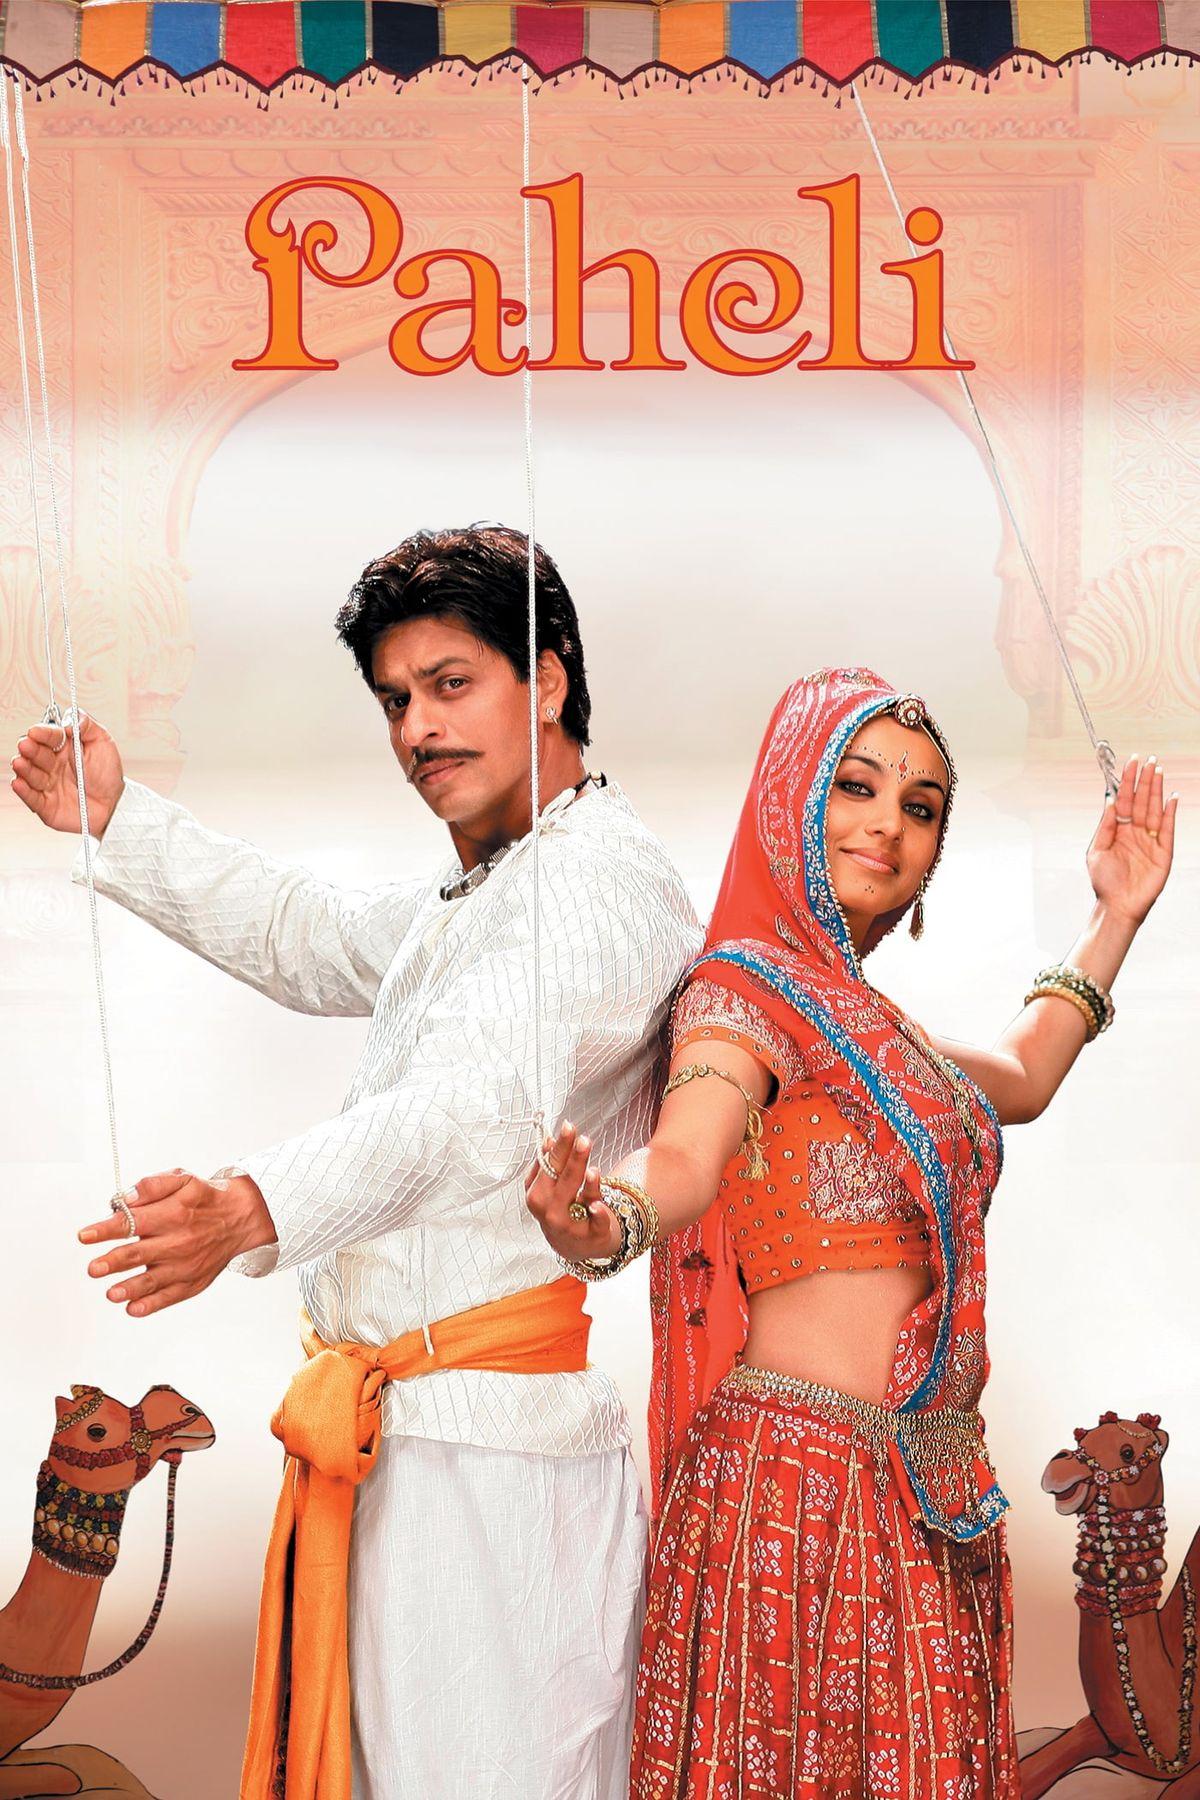 Dilip Prabhavalkar Best Movies, TV Shows and Web Series List